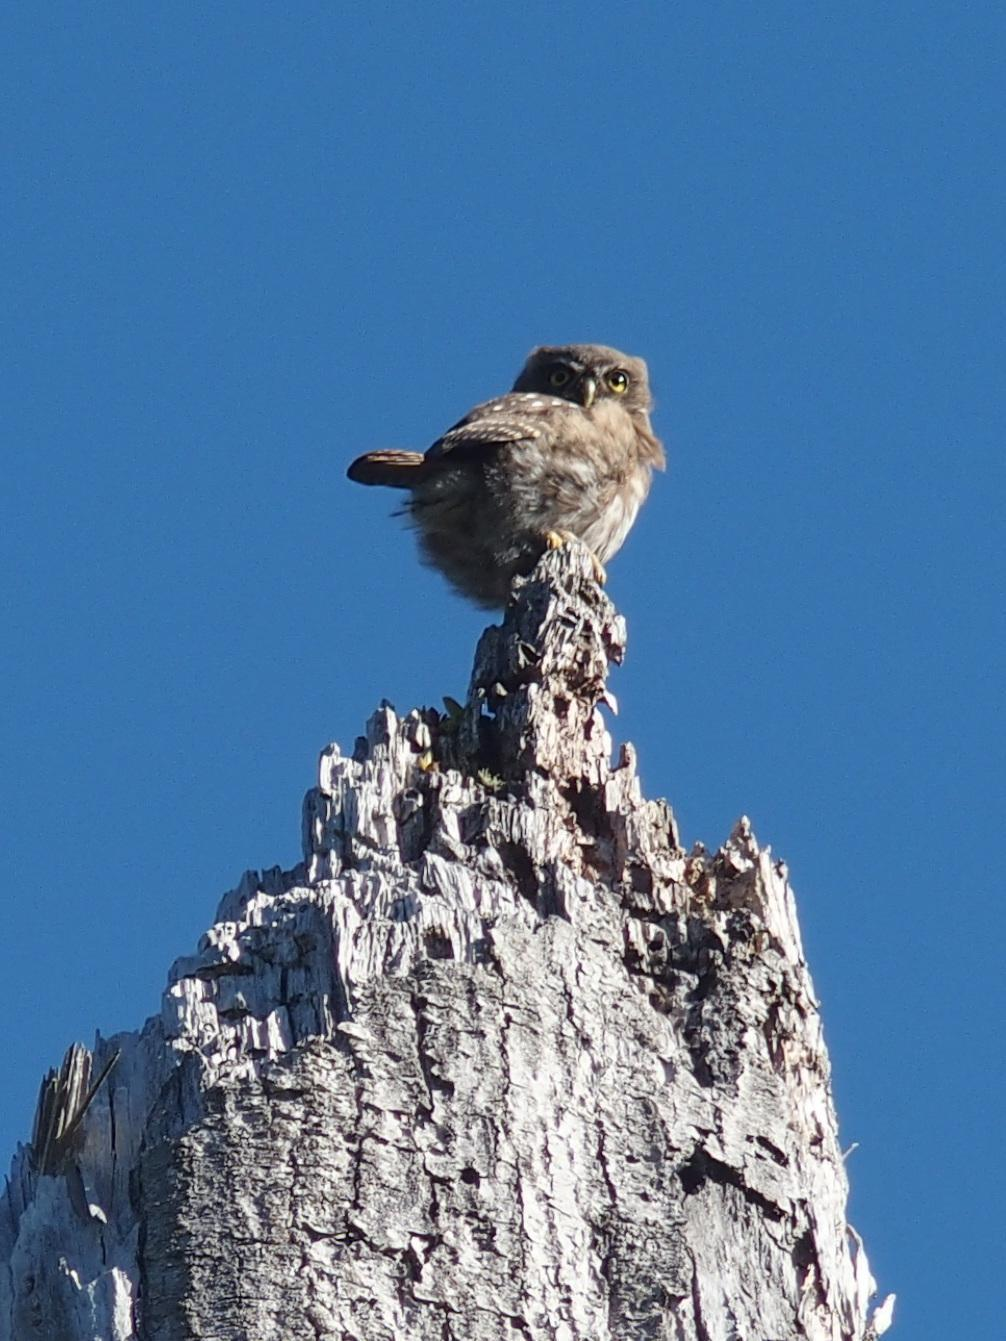 Austral Pygmy-Owl Photo by Montserrat Lara